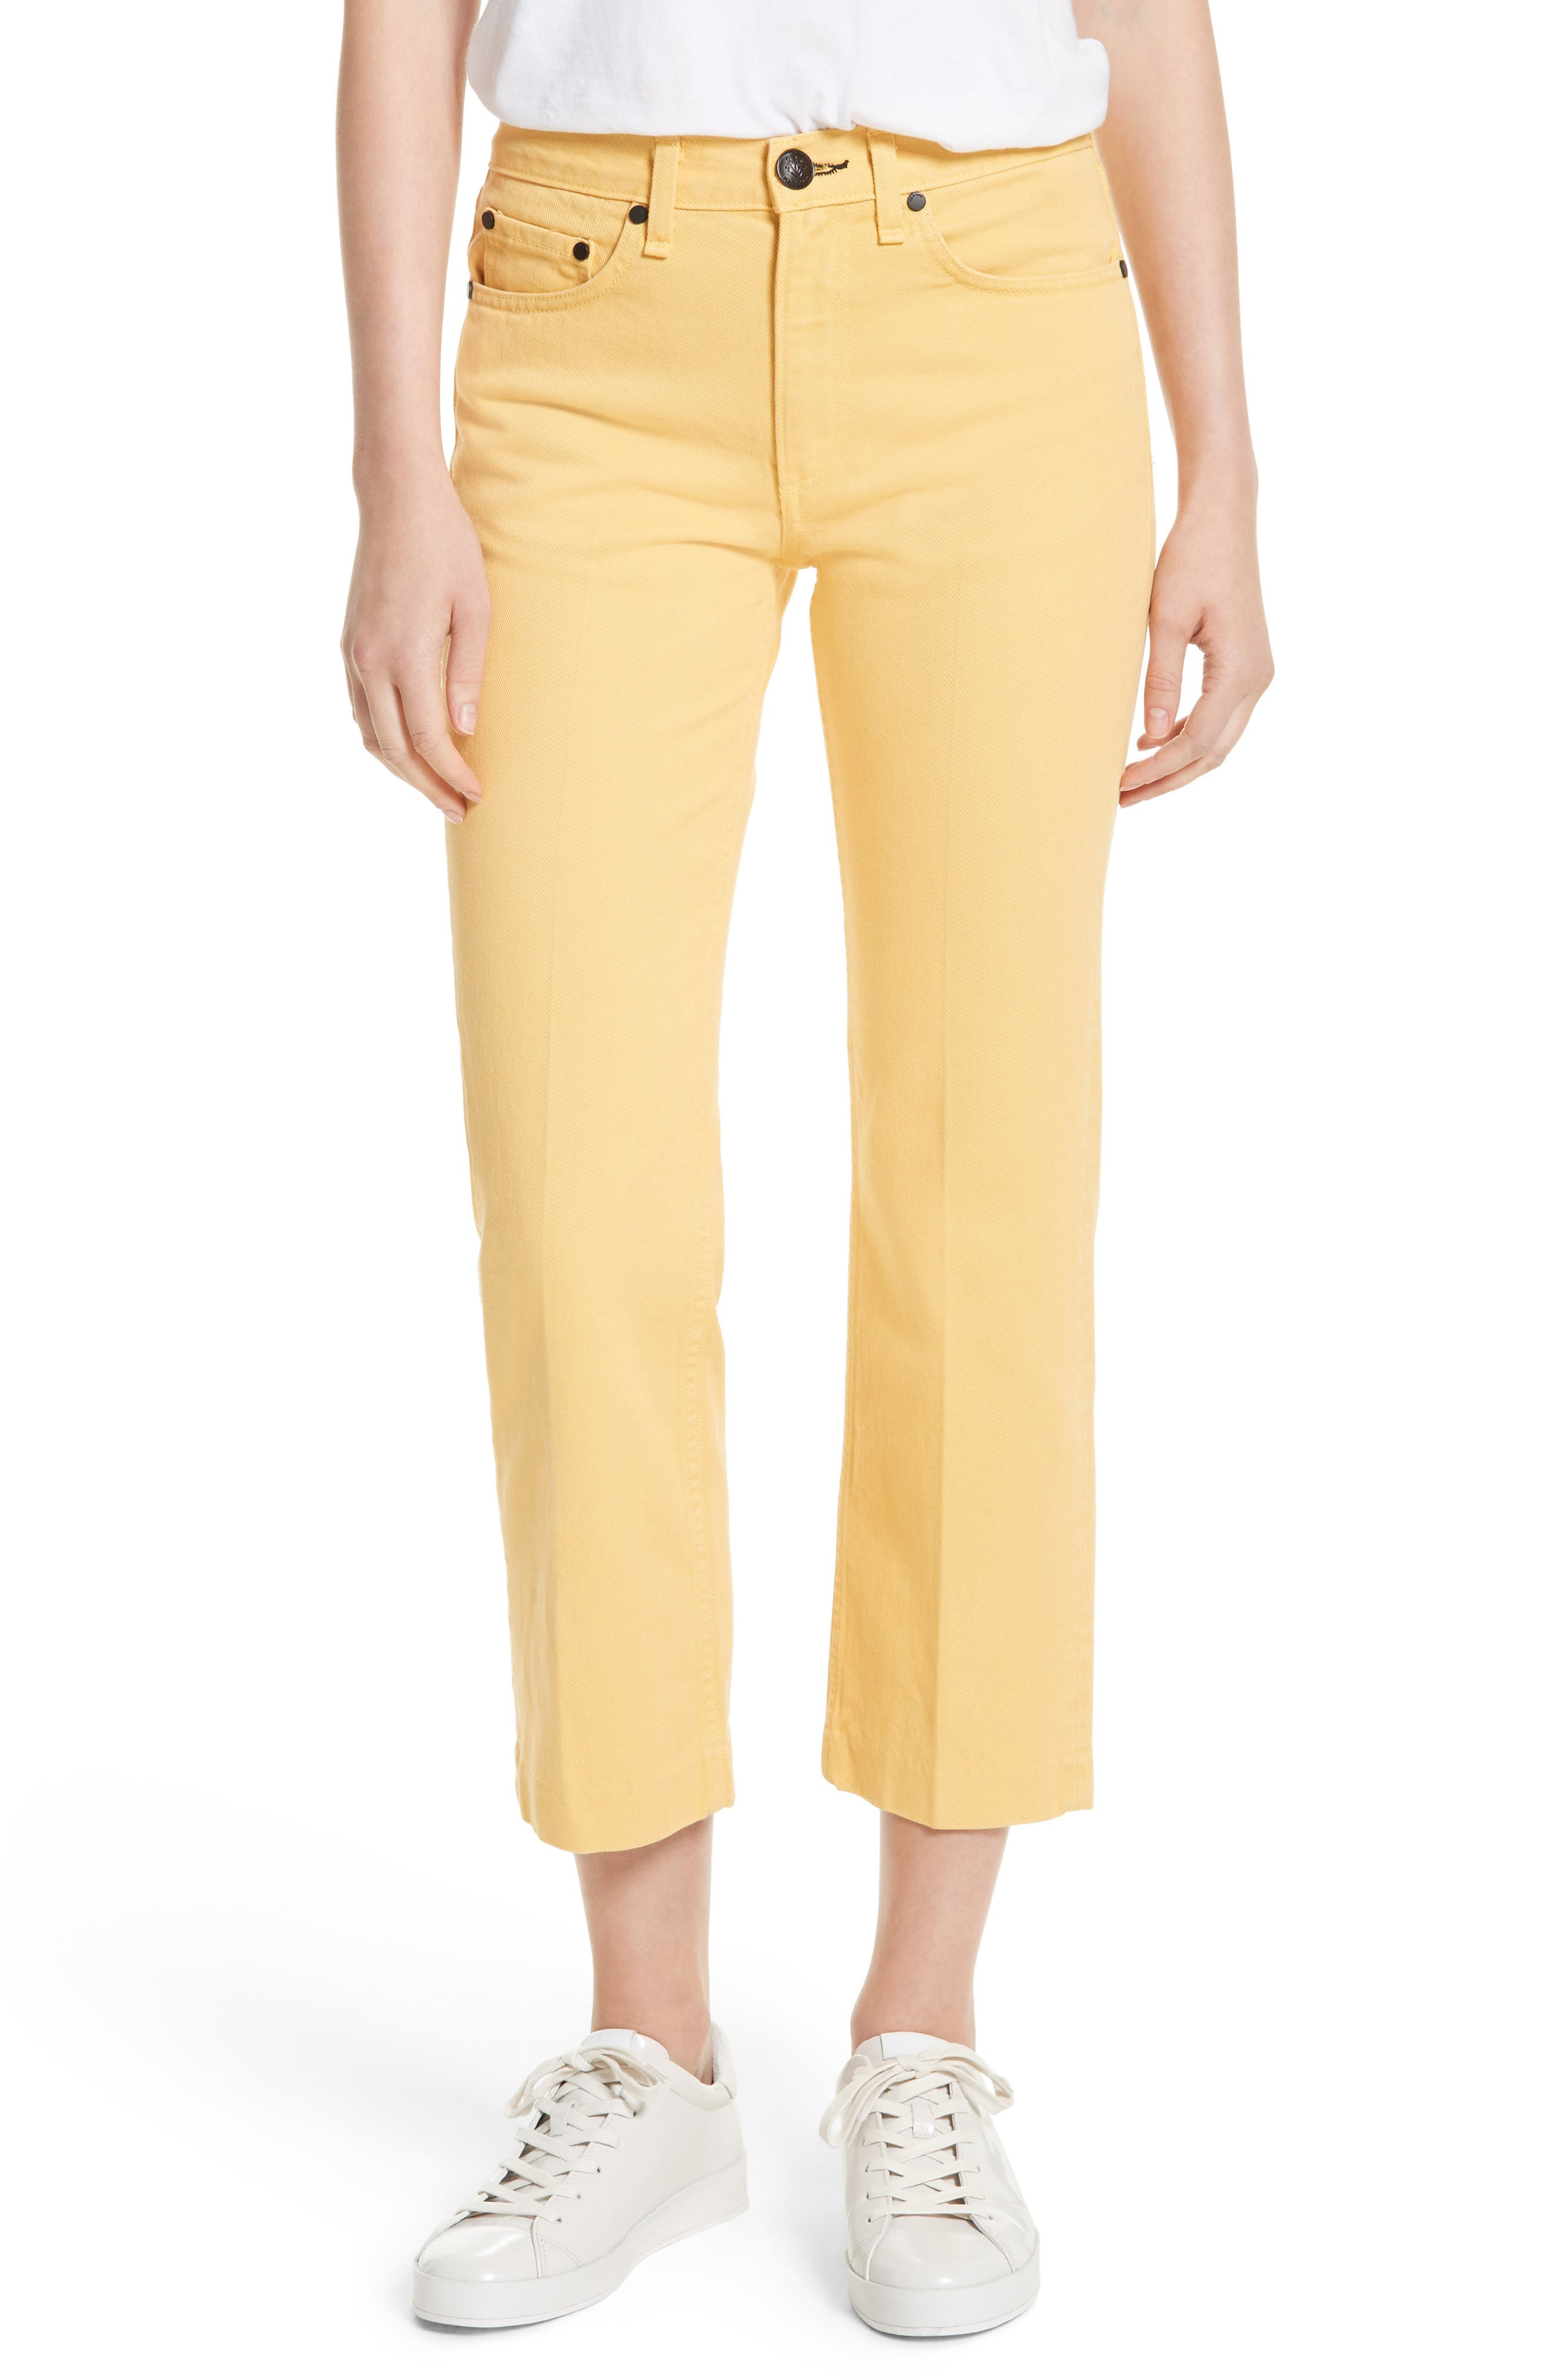 Alternate Image 1 Selected - rag & bone/JEAN Straight Leg Crop Jeans (Sunrise)